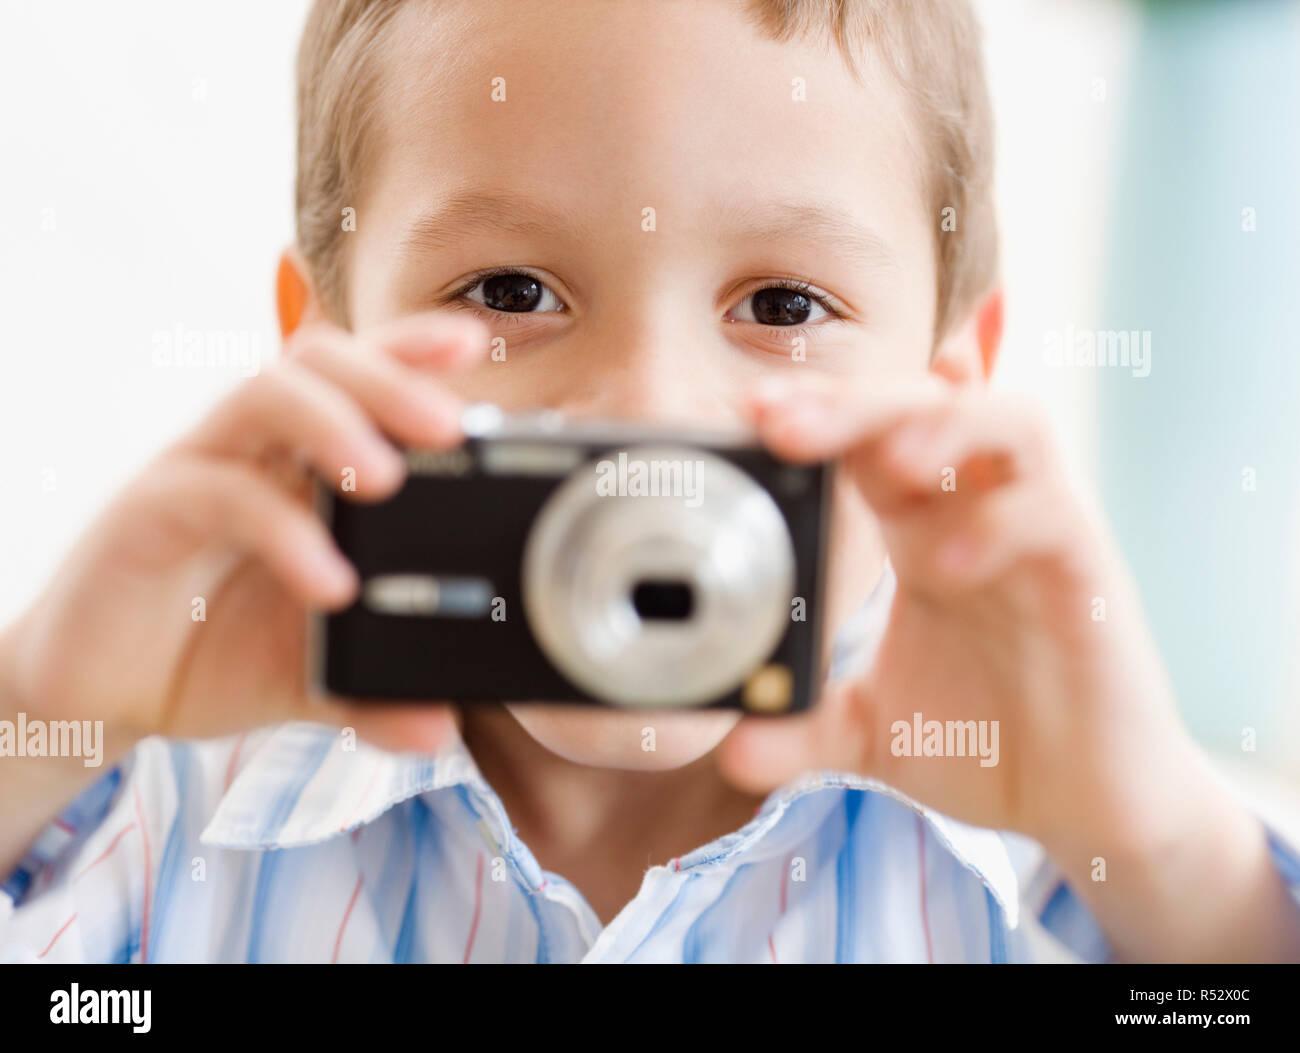 JGI/Blend Images - Stock Image